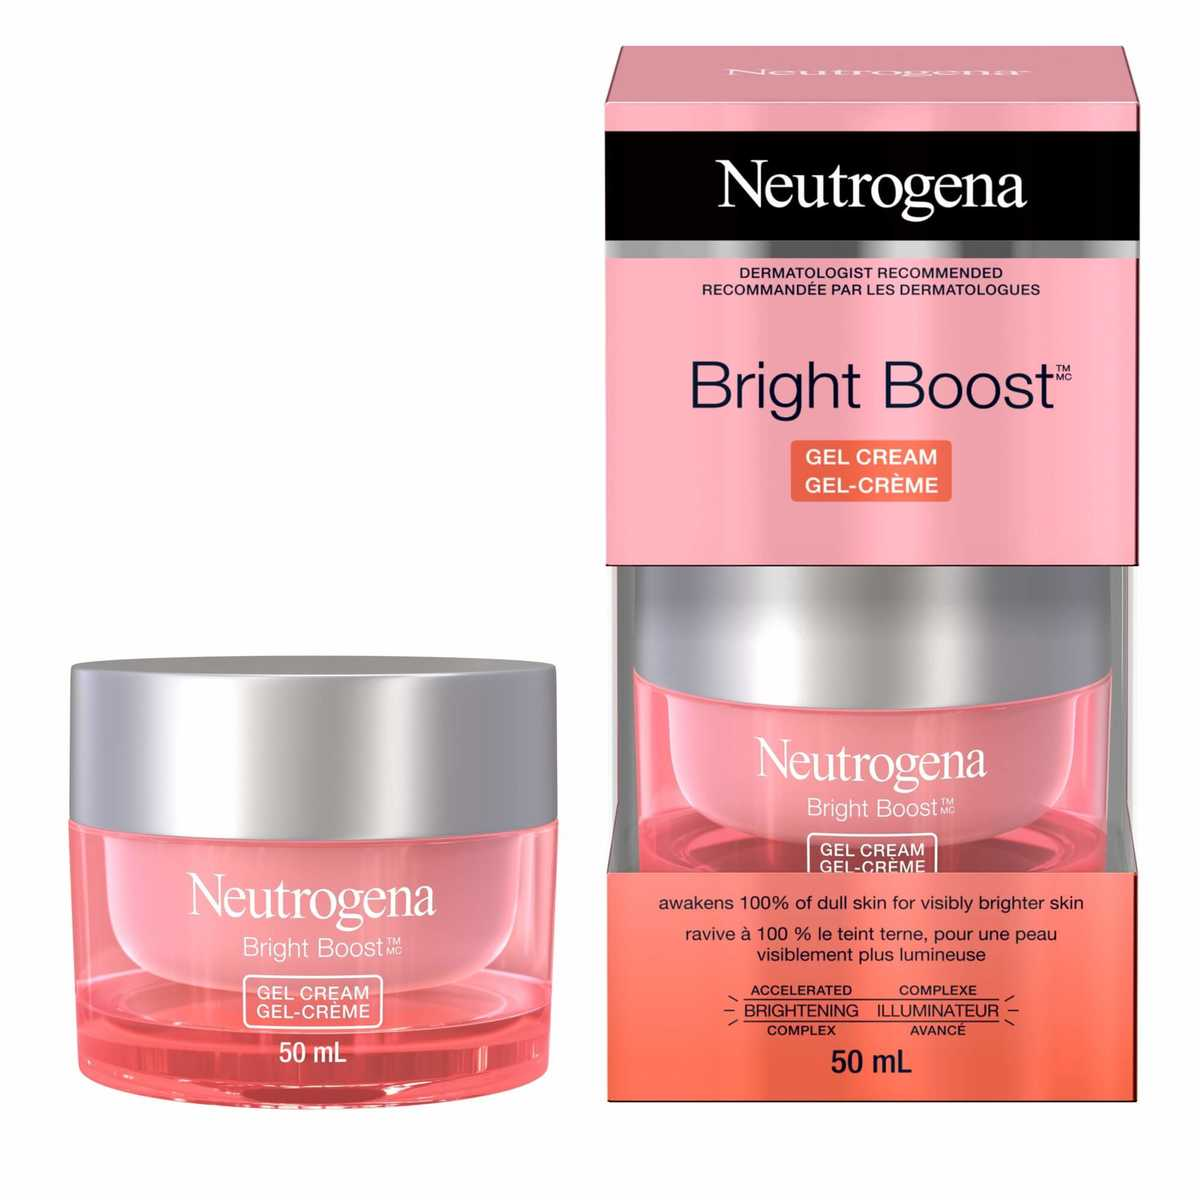 Gel-crème Neutrogena Bright Boost